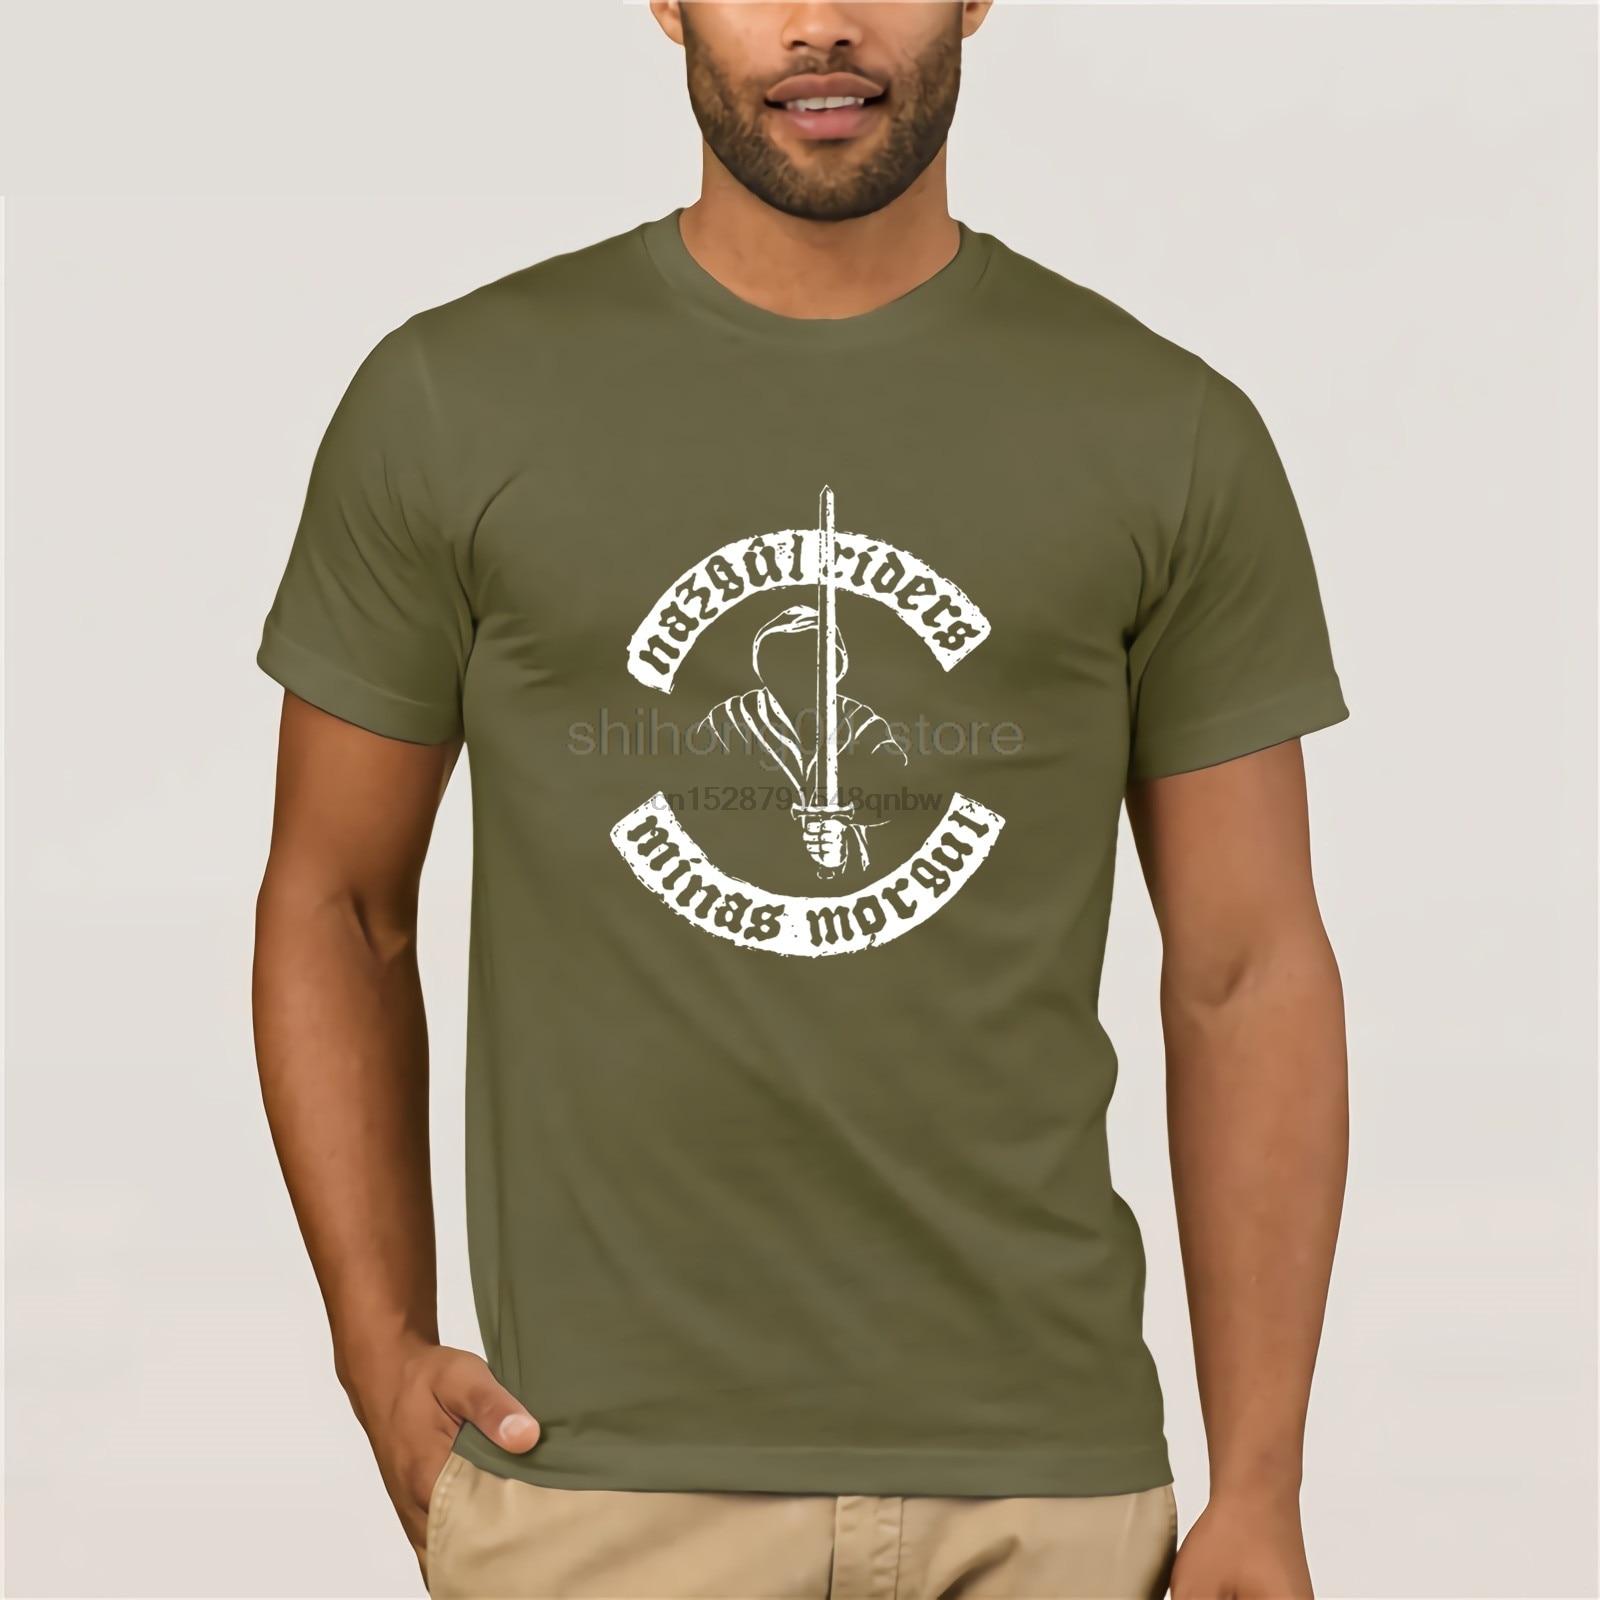 Camiseta de Sauron Nazgul camiseta de jinetes manga corta 6xl camiseta 100 algodón Streetwear impresionante gráfico masculino camiseta